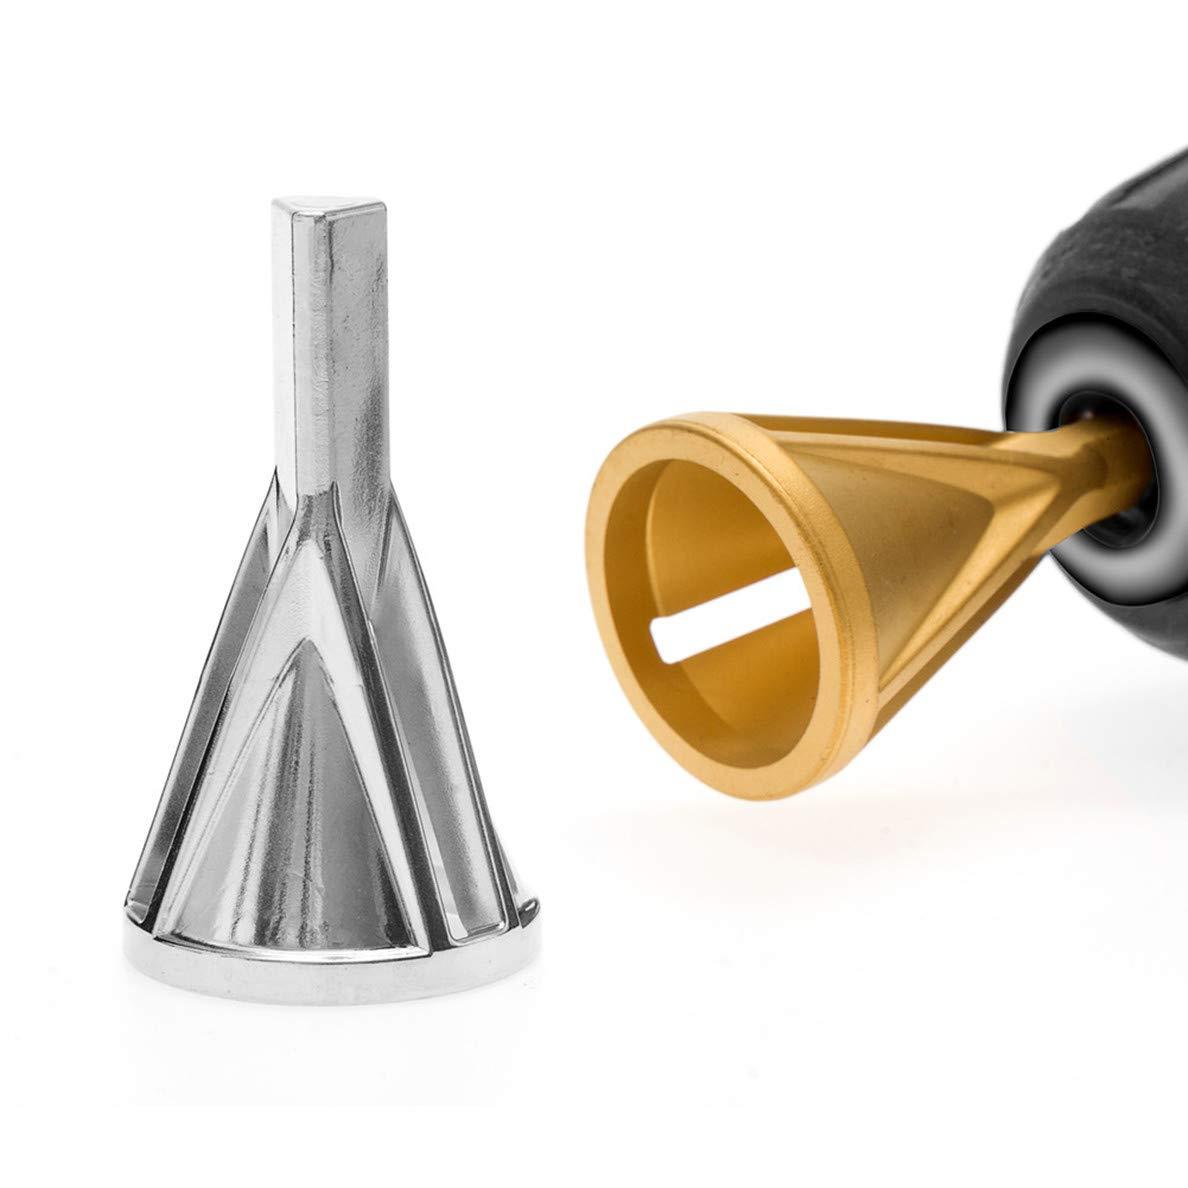 Sunxenze 2PCS Deburring External Chamfer Tool Triangle Shank Silver Remove Burr Repairs Tools for Bolts Hexagon Shank Gold